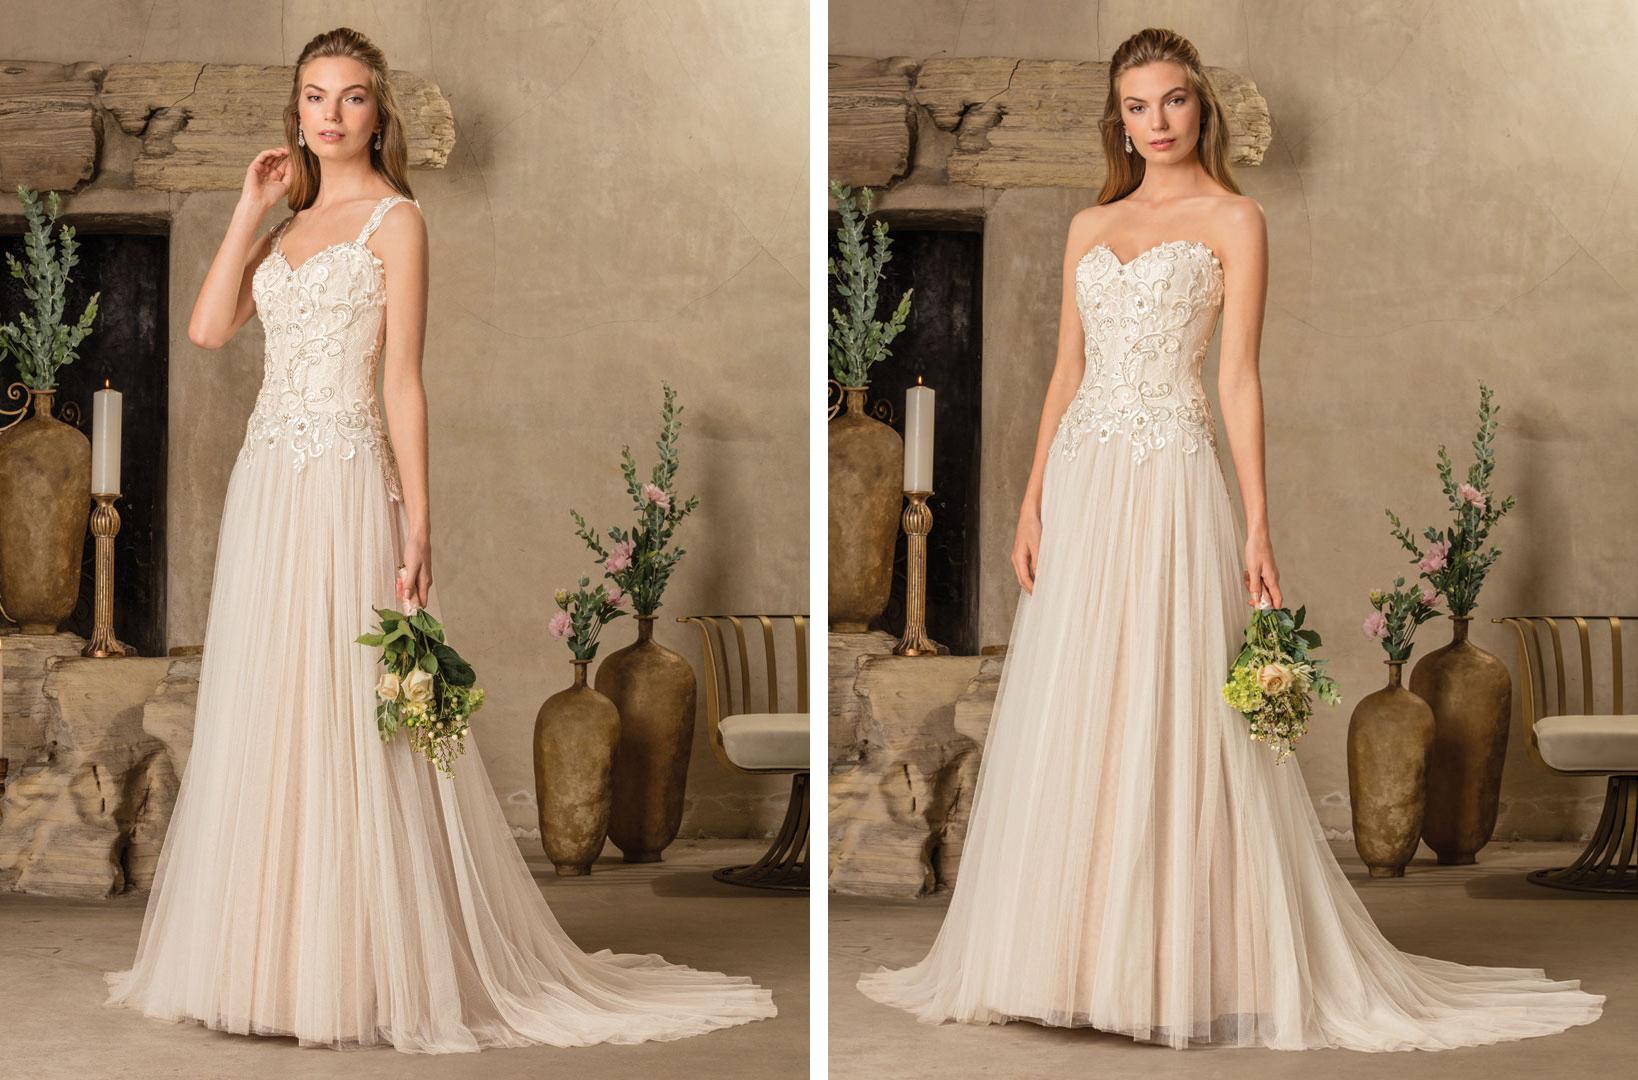 Bridal water lily 2226 wedding dresses photos brides com -  Two In One Wedding Dress Casablanca Bridal